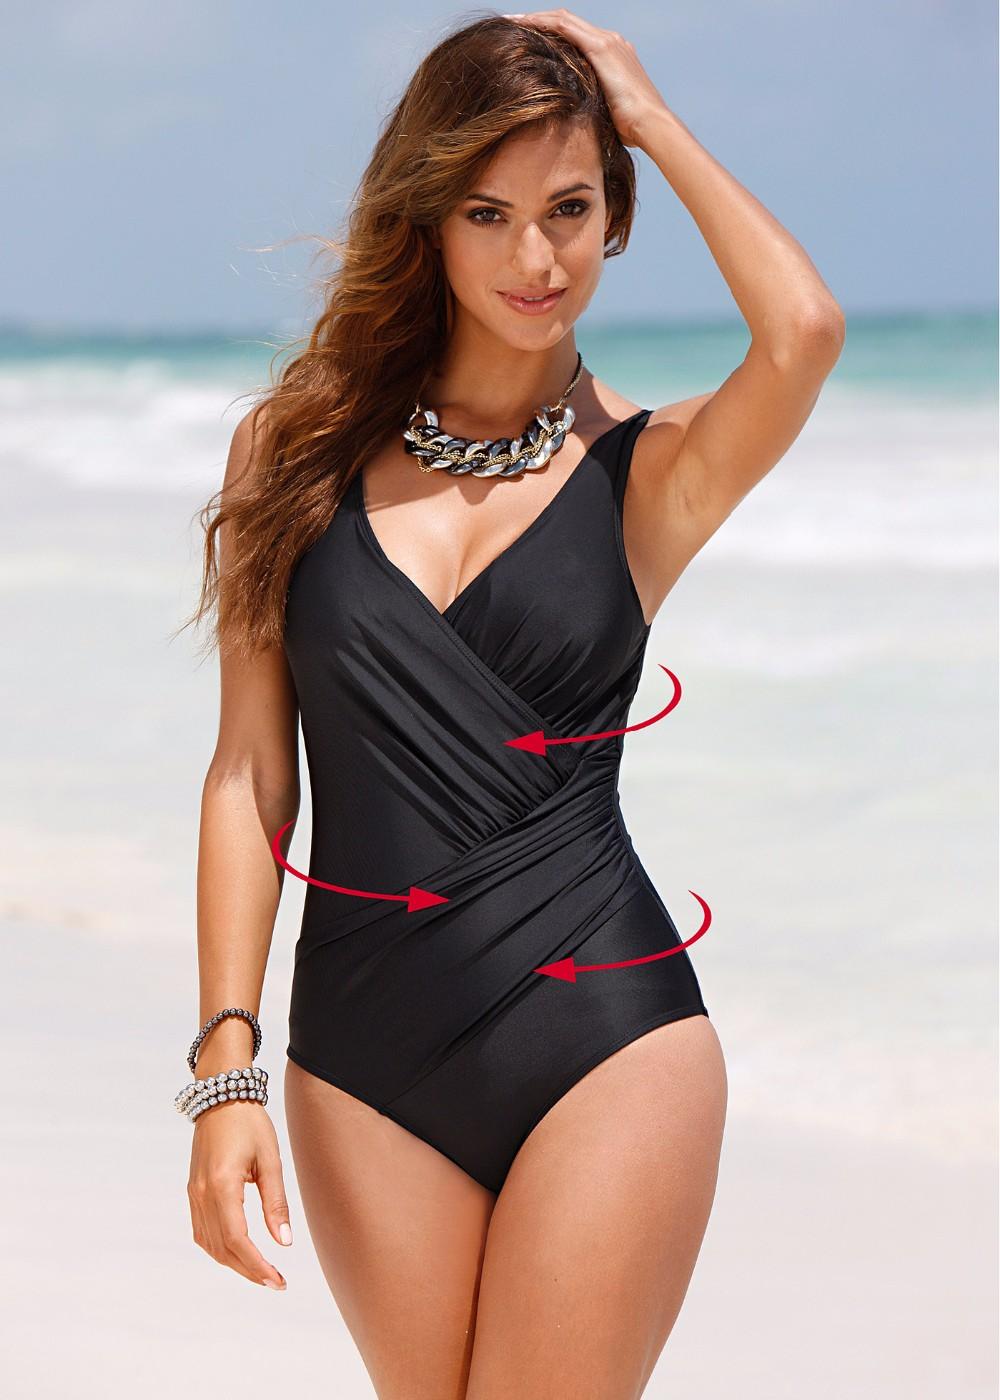 mayo bikini,mayo modelleri,bikini  modelleri,ucuz bikini,ucuz mayo,bikini satın al